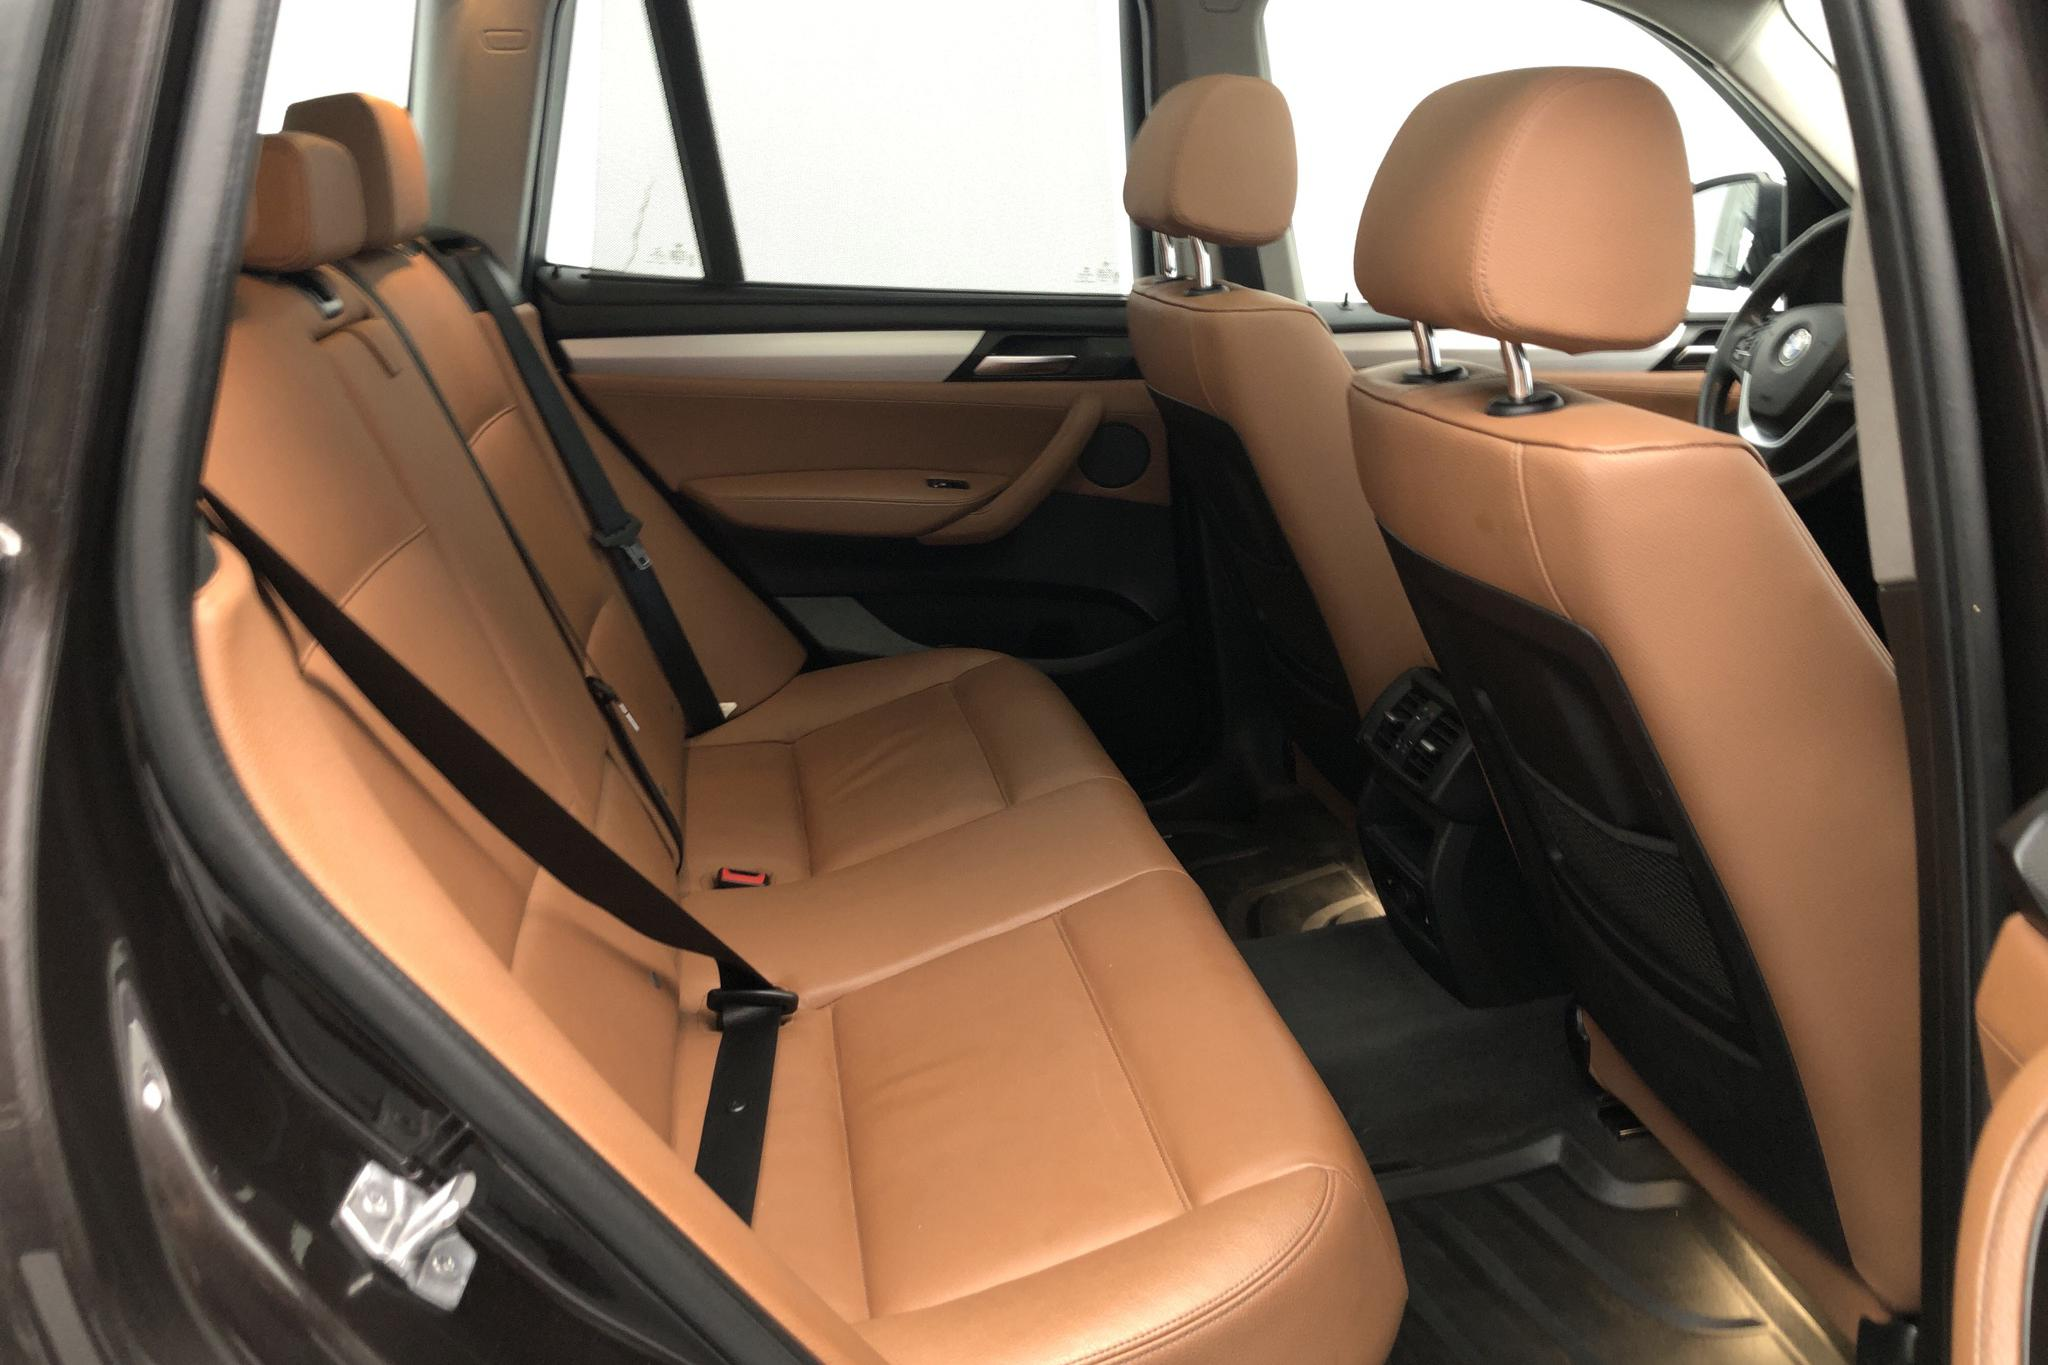 BMW X3 xDrive20d, F25 (190hk) - 154 980 km - Automatic - brown - 2016